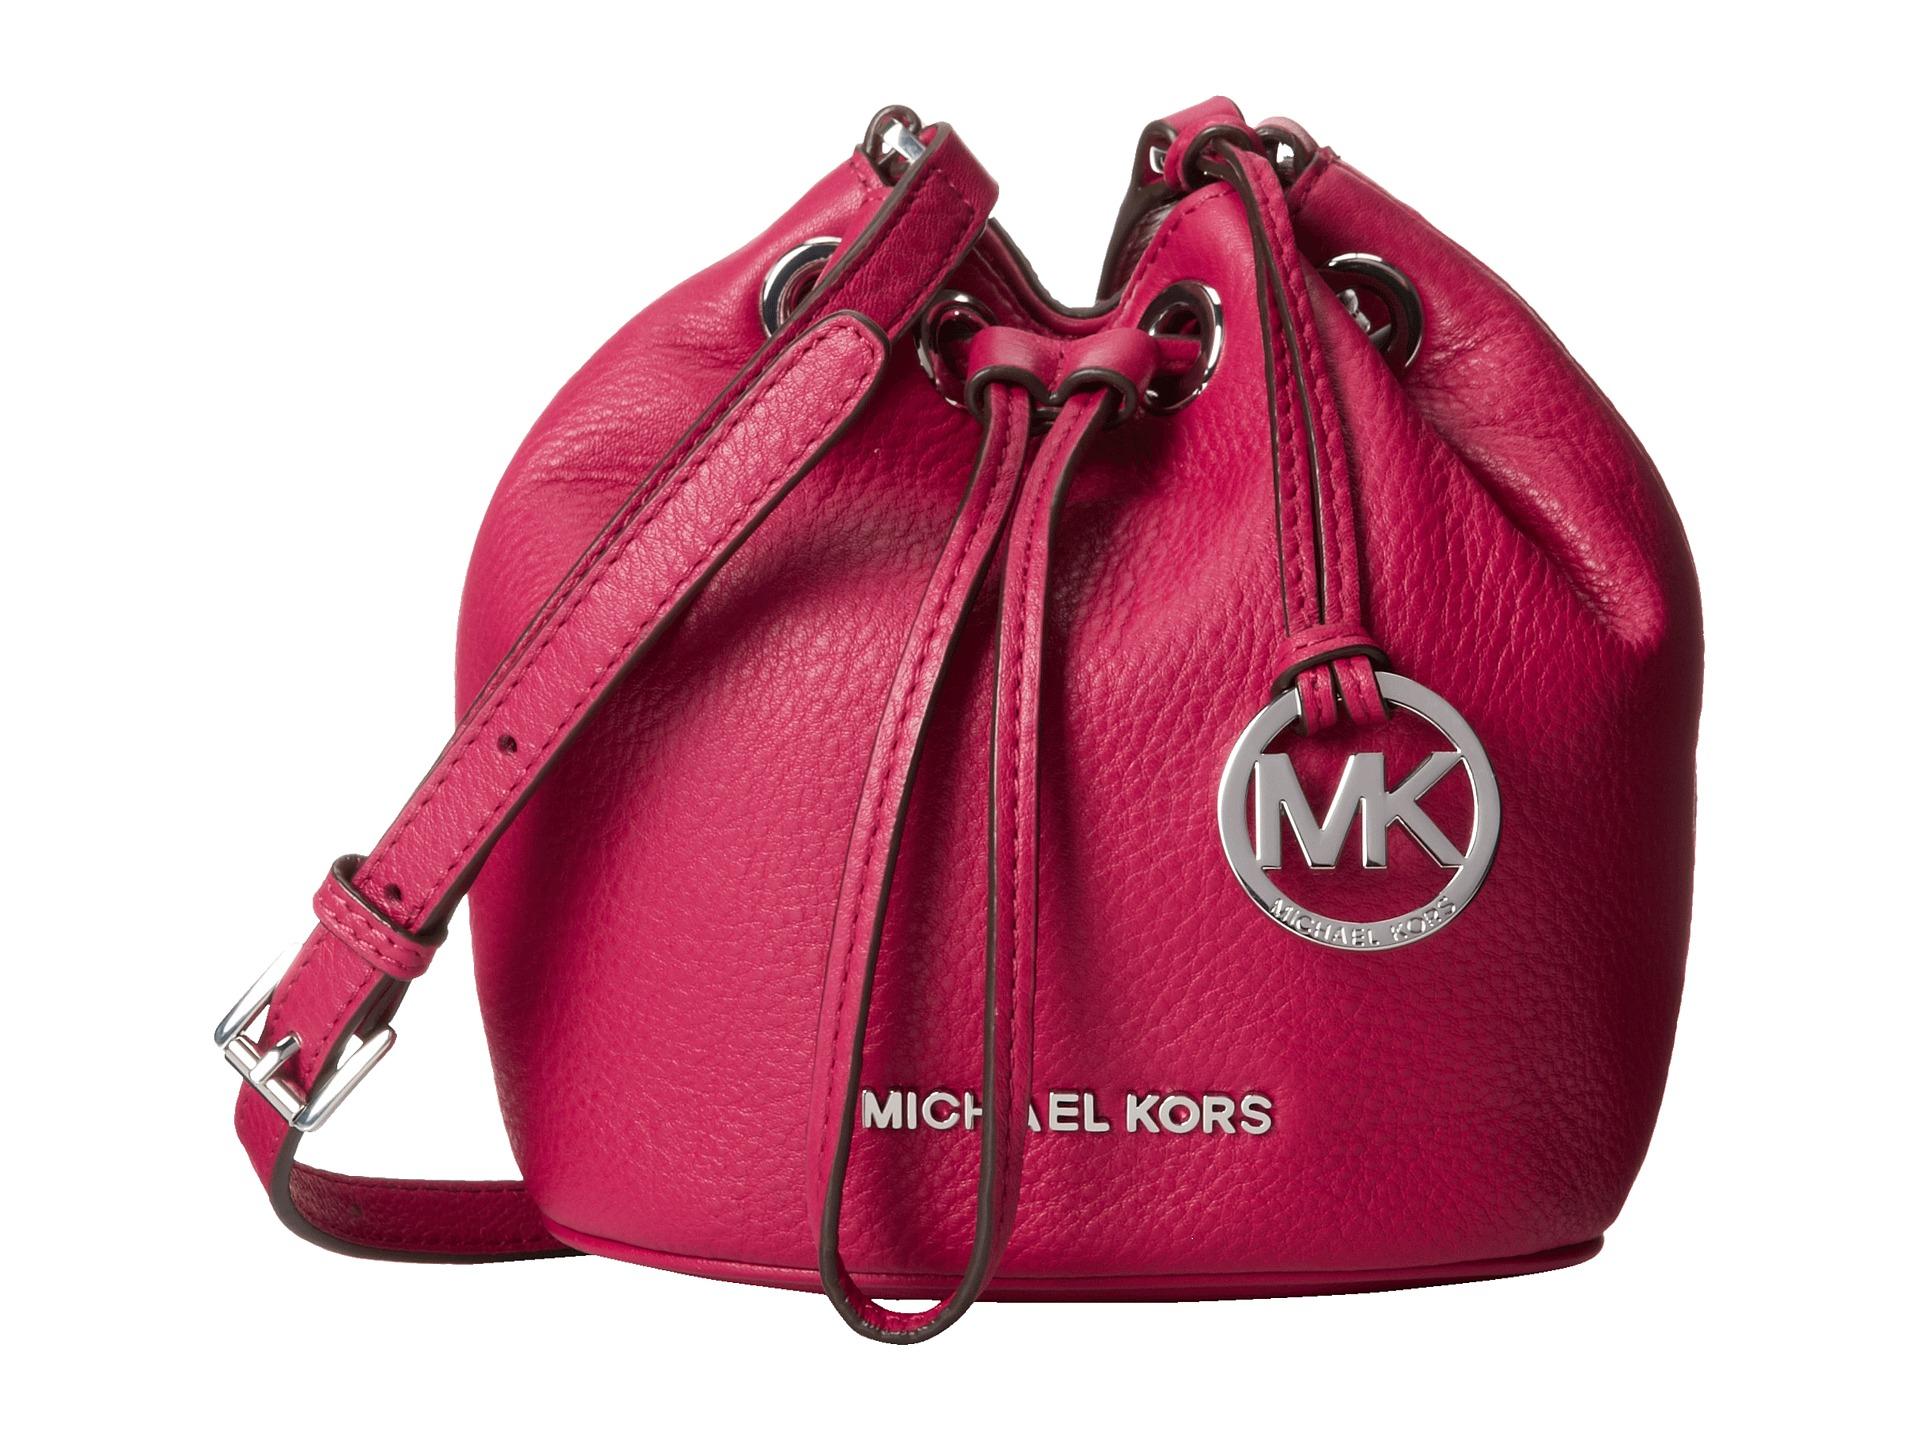 a23dfe3dcc10 ... bucket bag in ecdd7 fee19; good lyst michael michael kors jules  drawstring crossbody in pink 7ccb1 37ffd